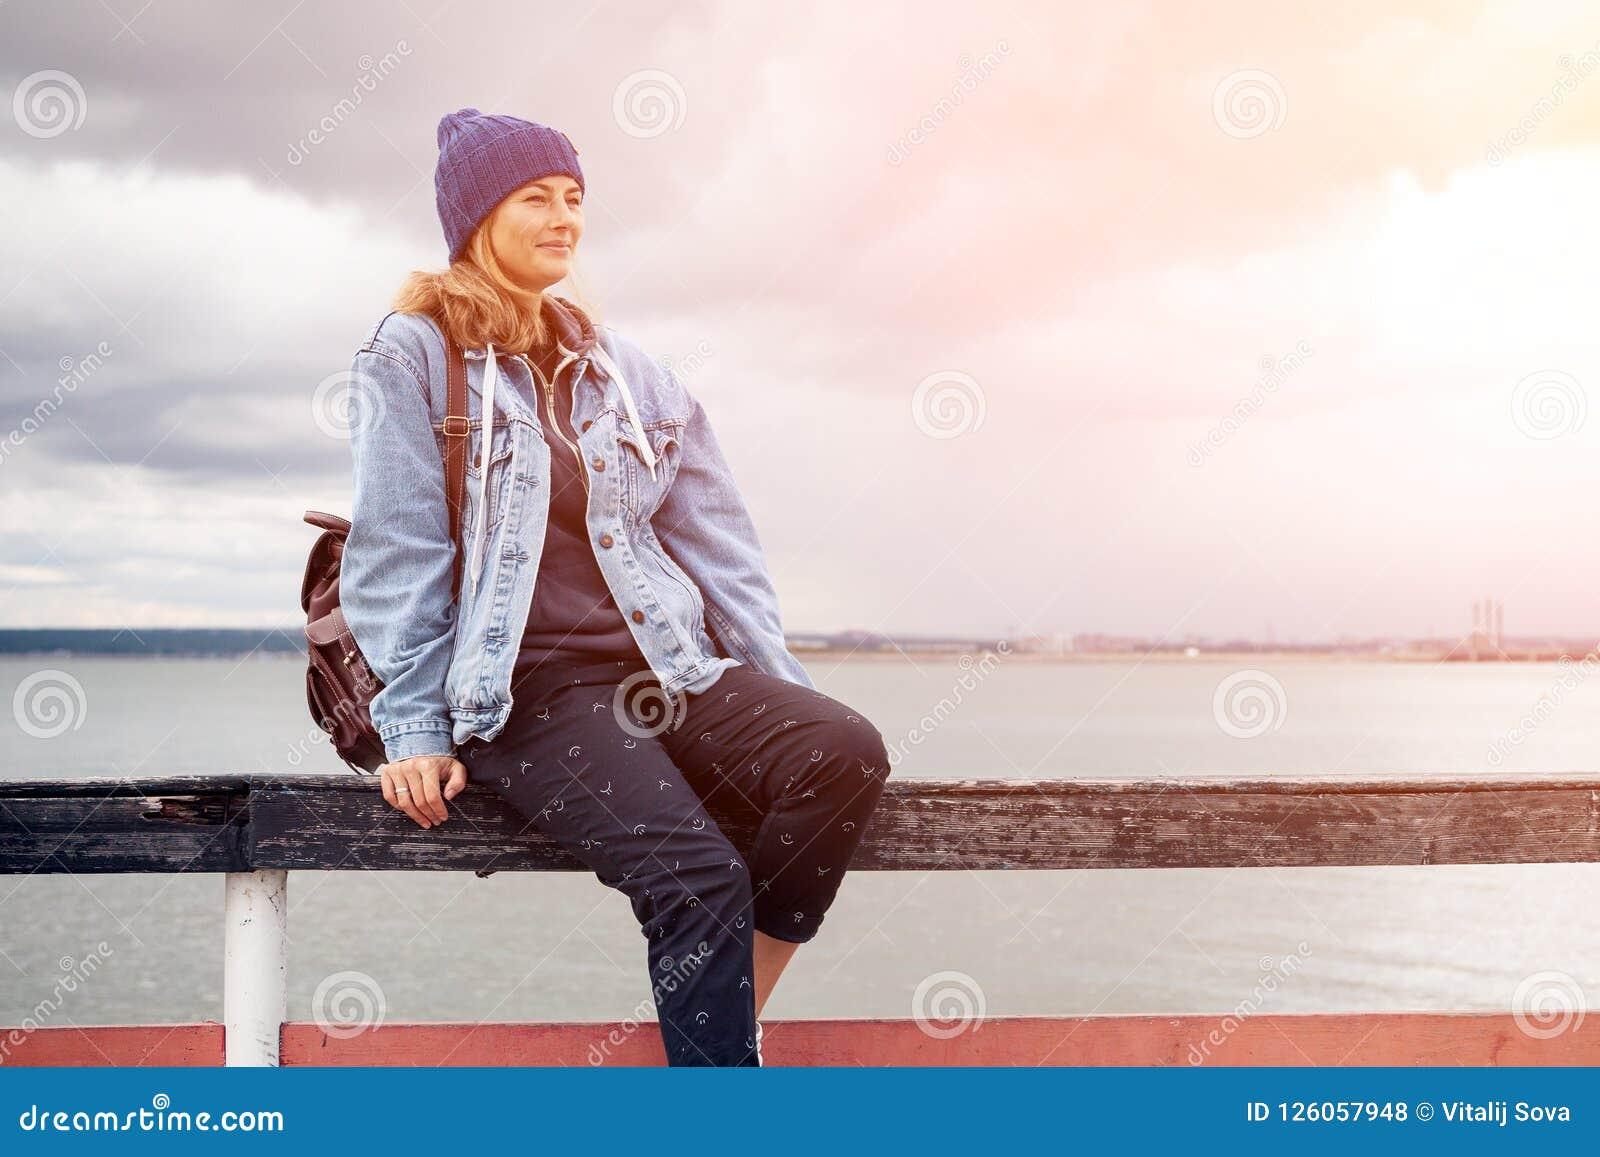 Portrait of outdoor atmospheric lifestyle photo